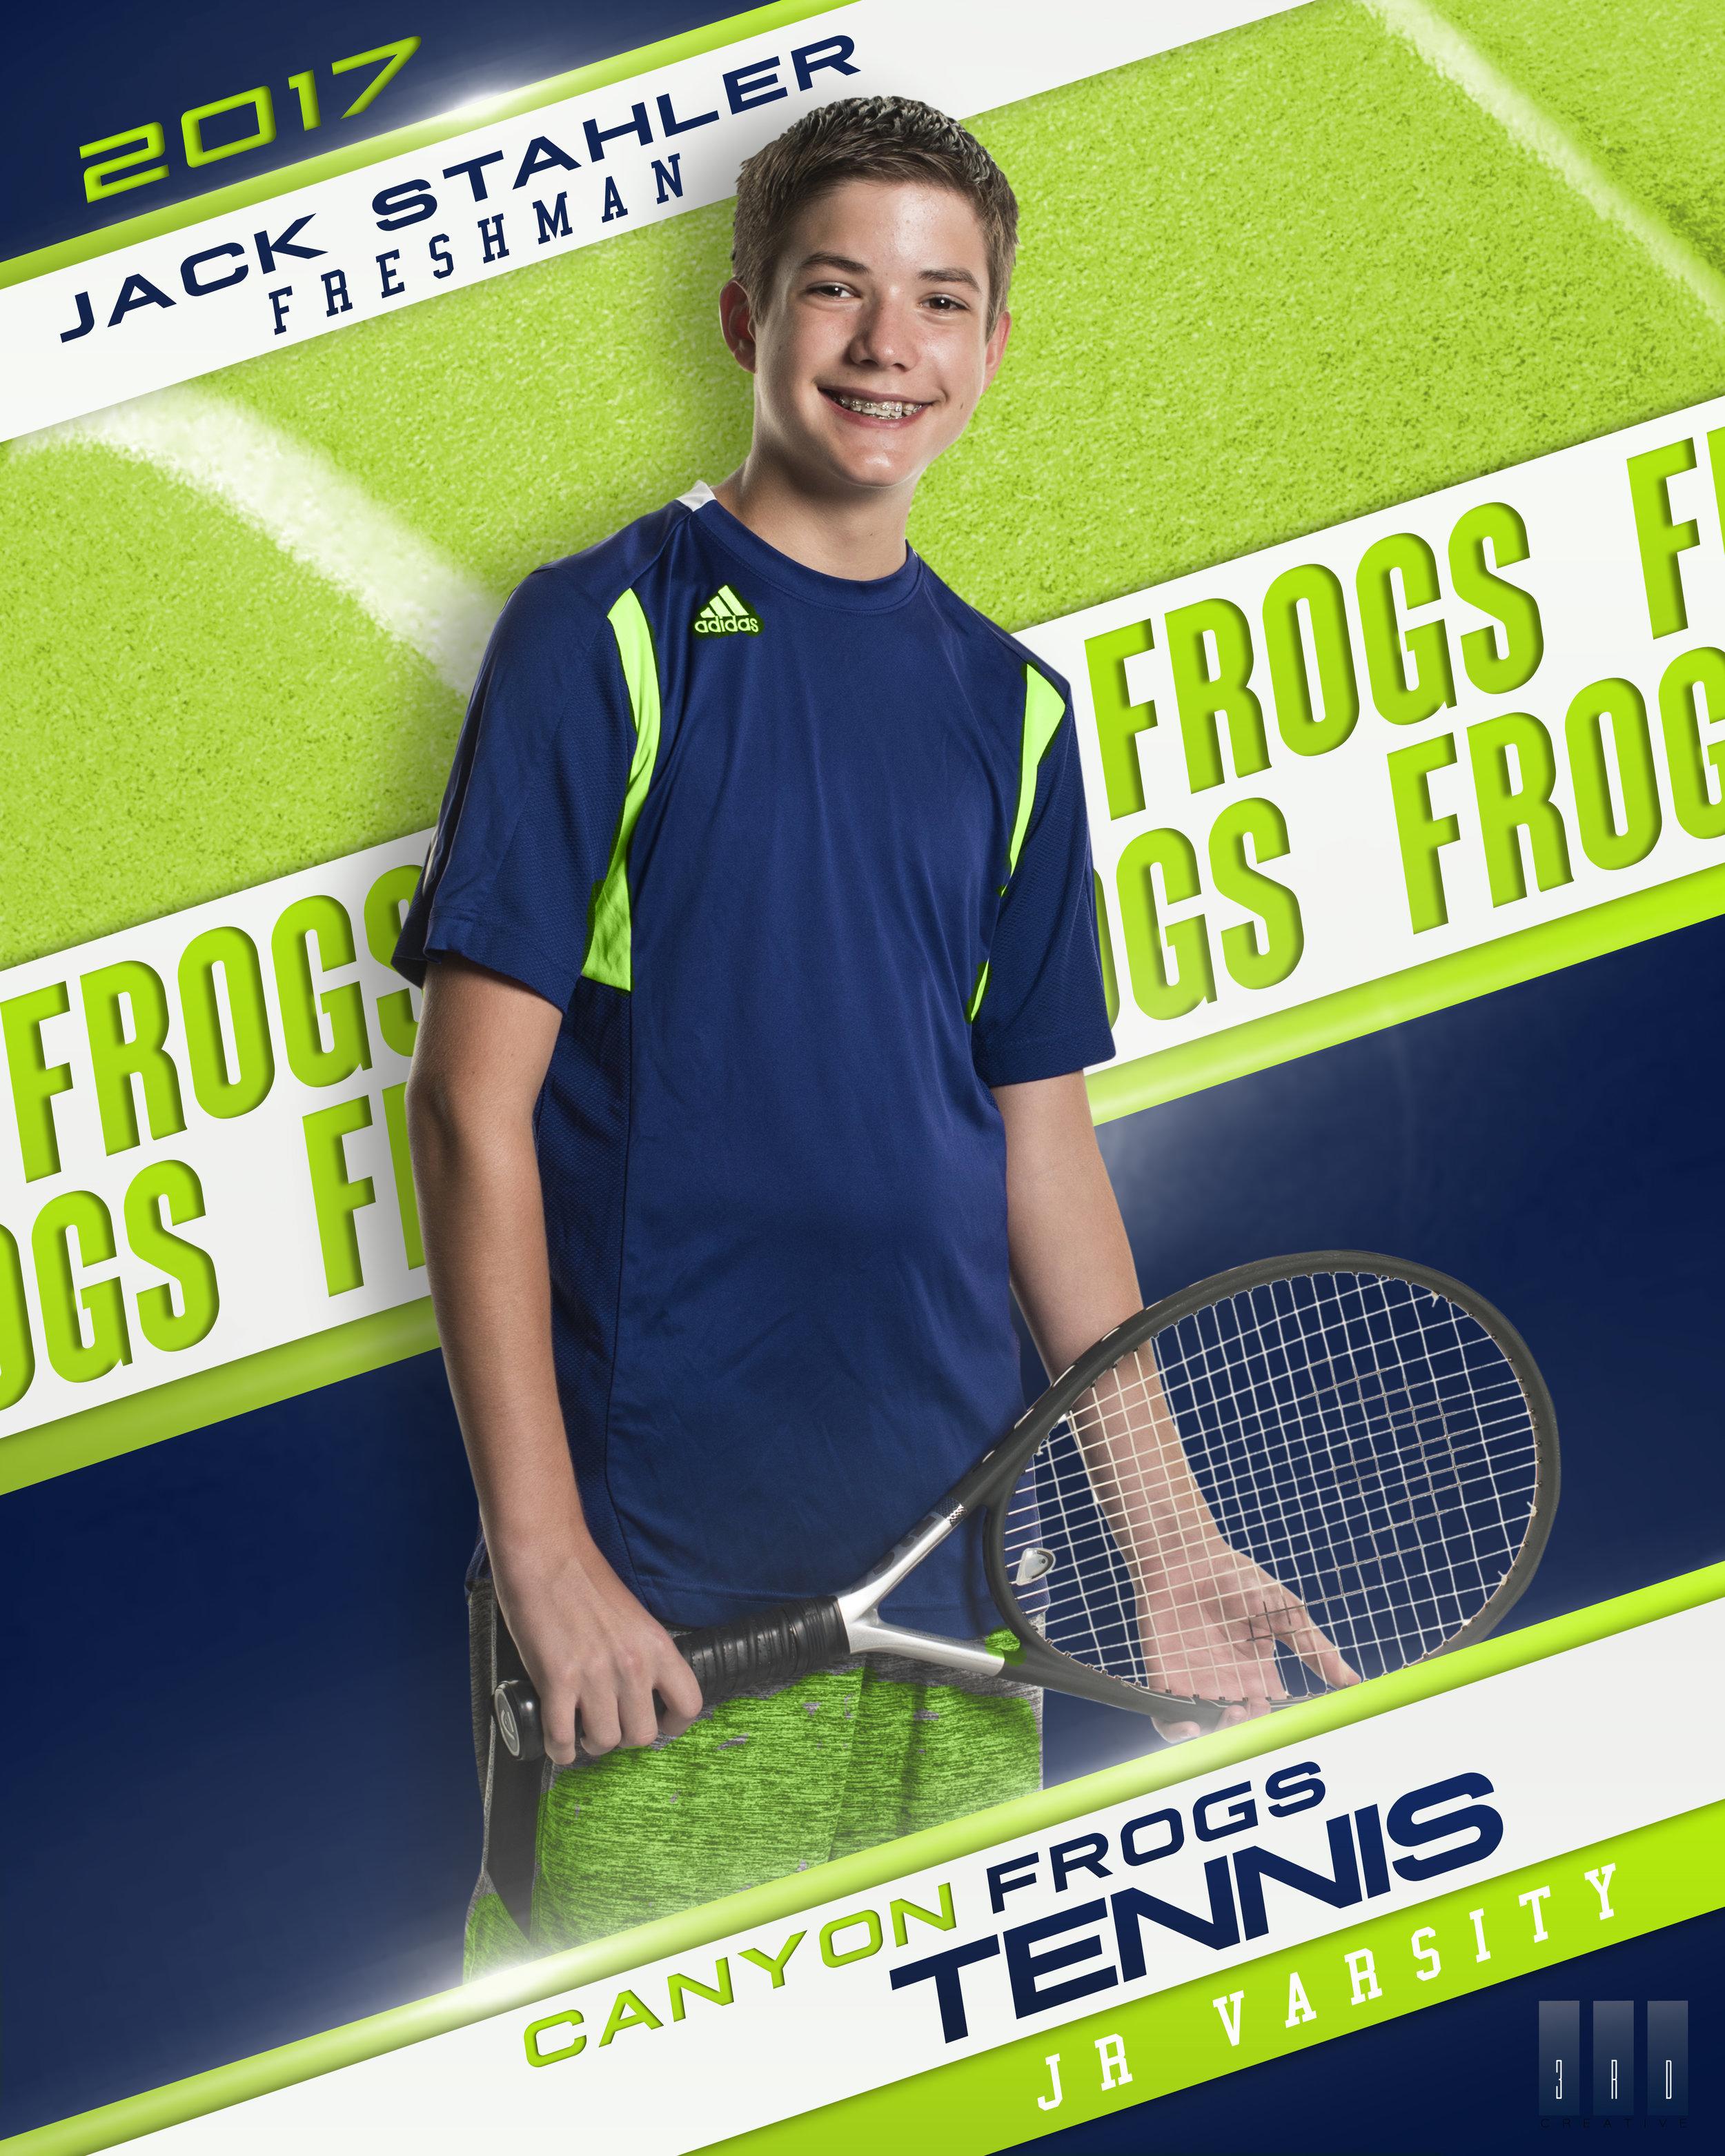 6_Tennis_Utility_Player_16x20_Ind.jpg